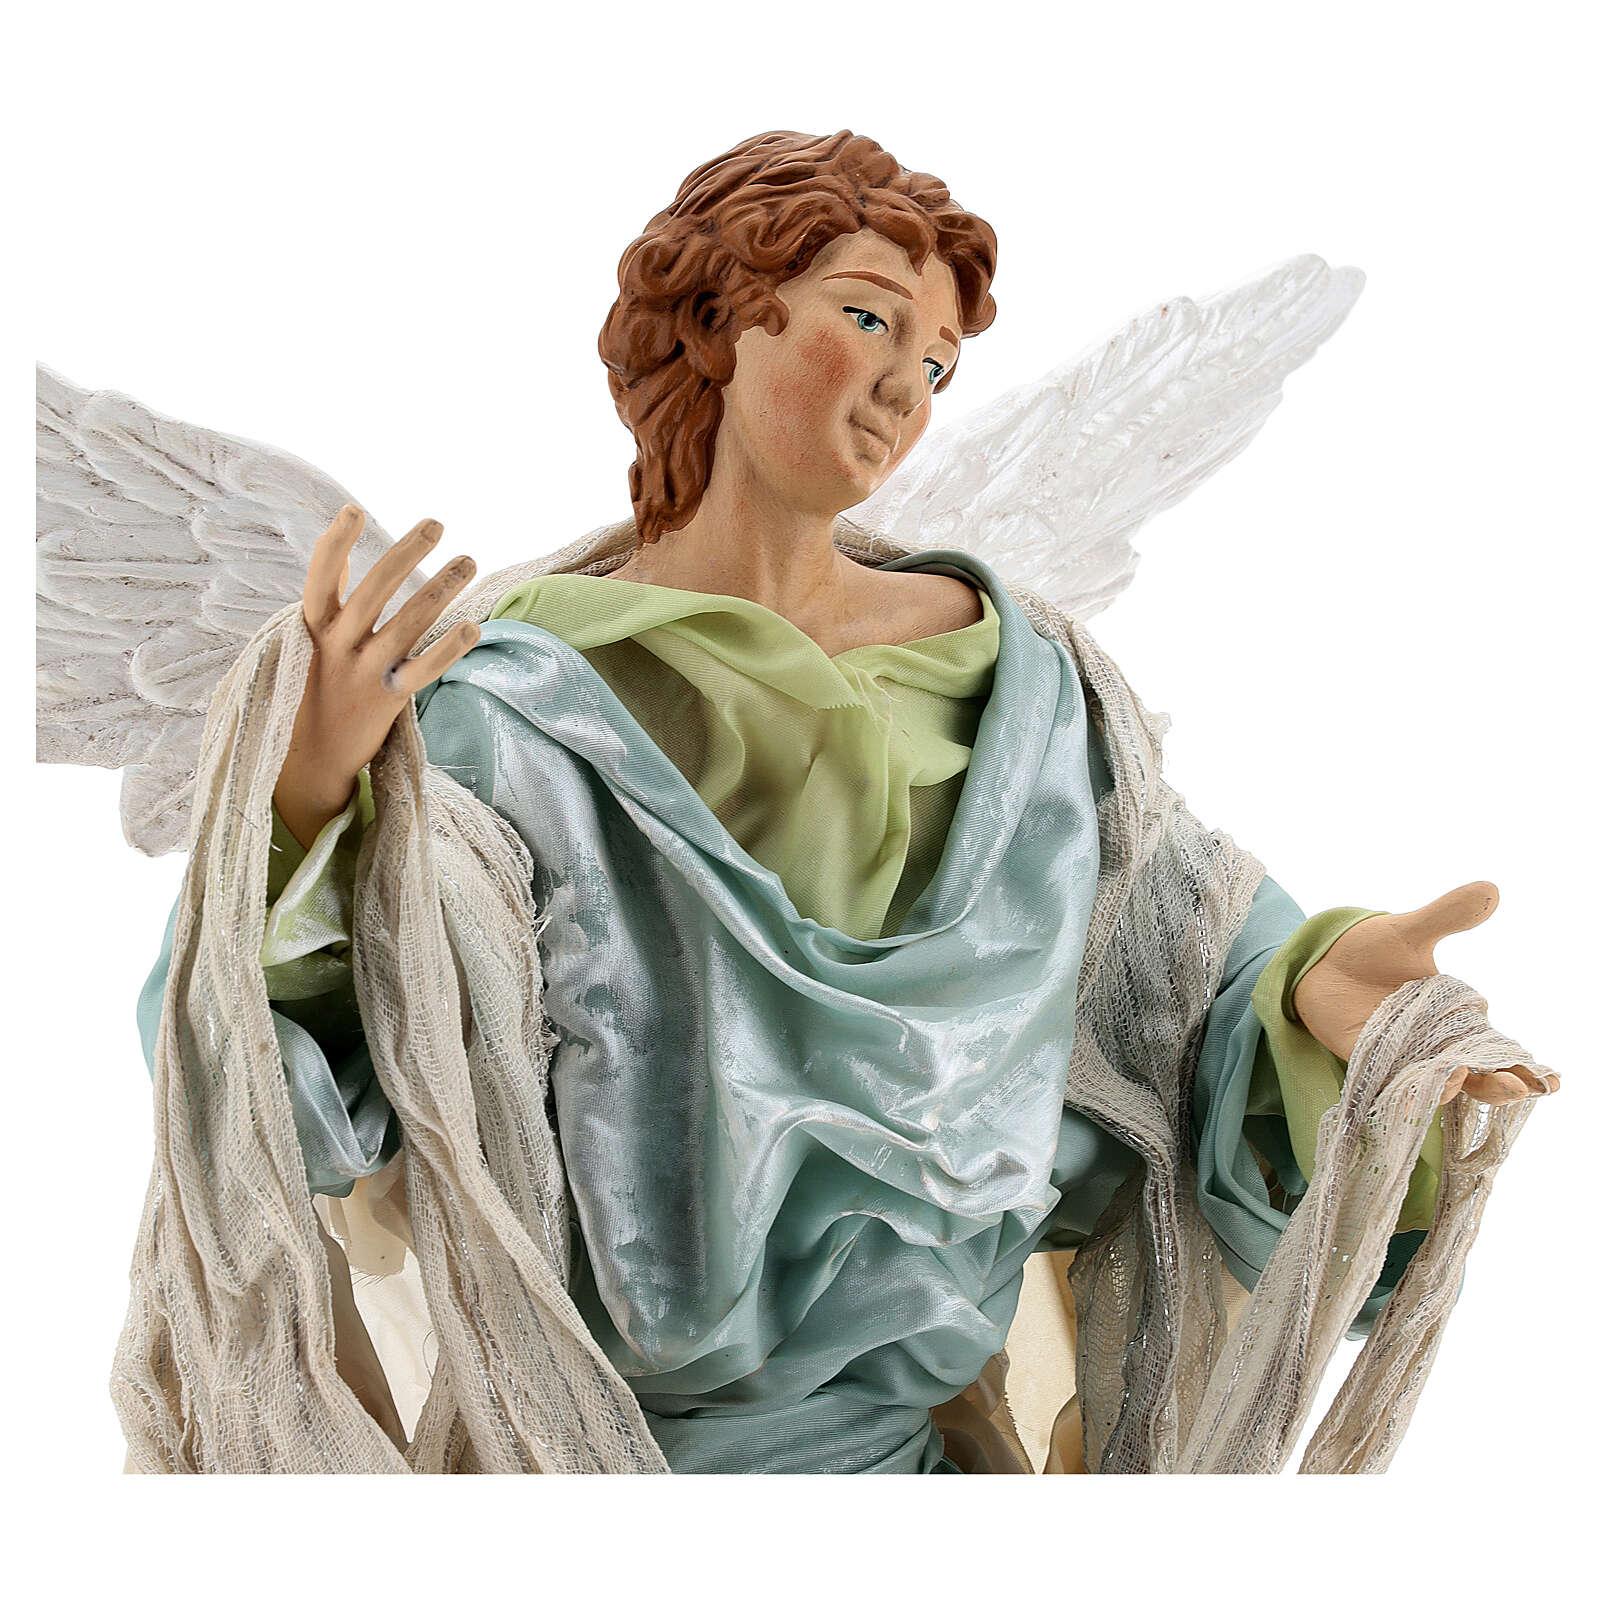 Angelo biondo presepe napoletano 45 cm terracotta stoffa piedistallo 4